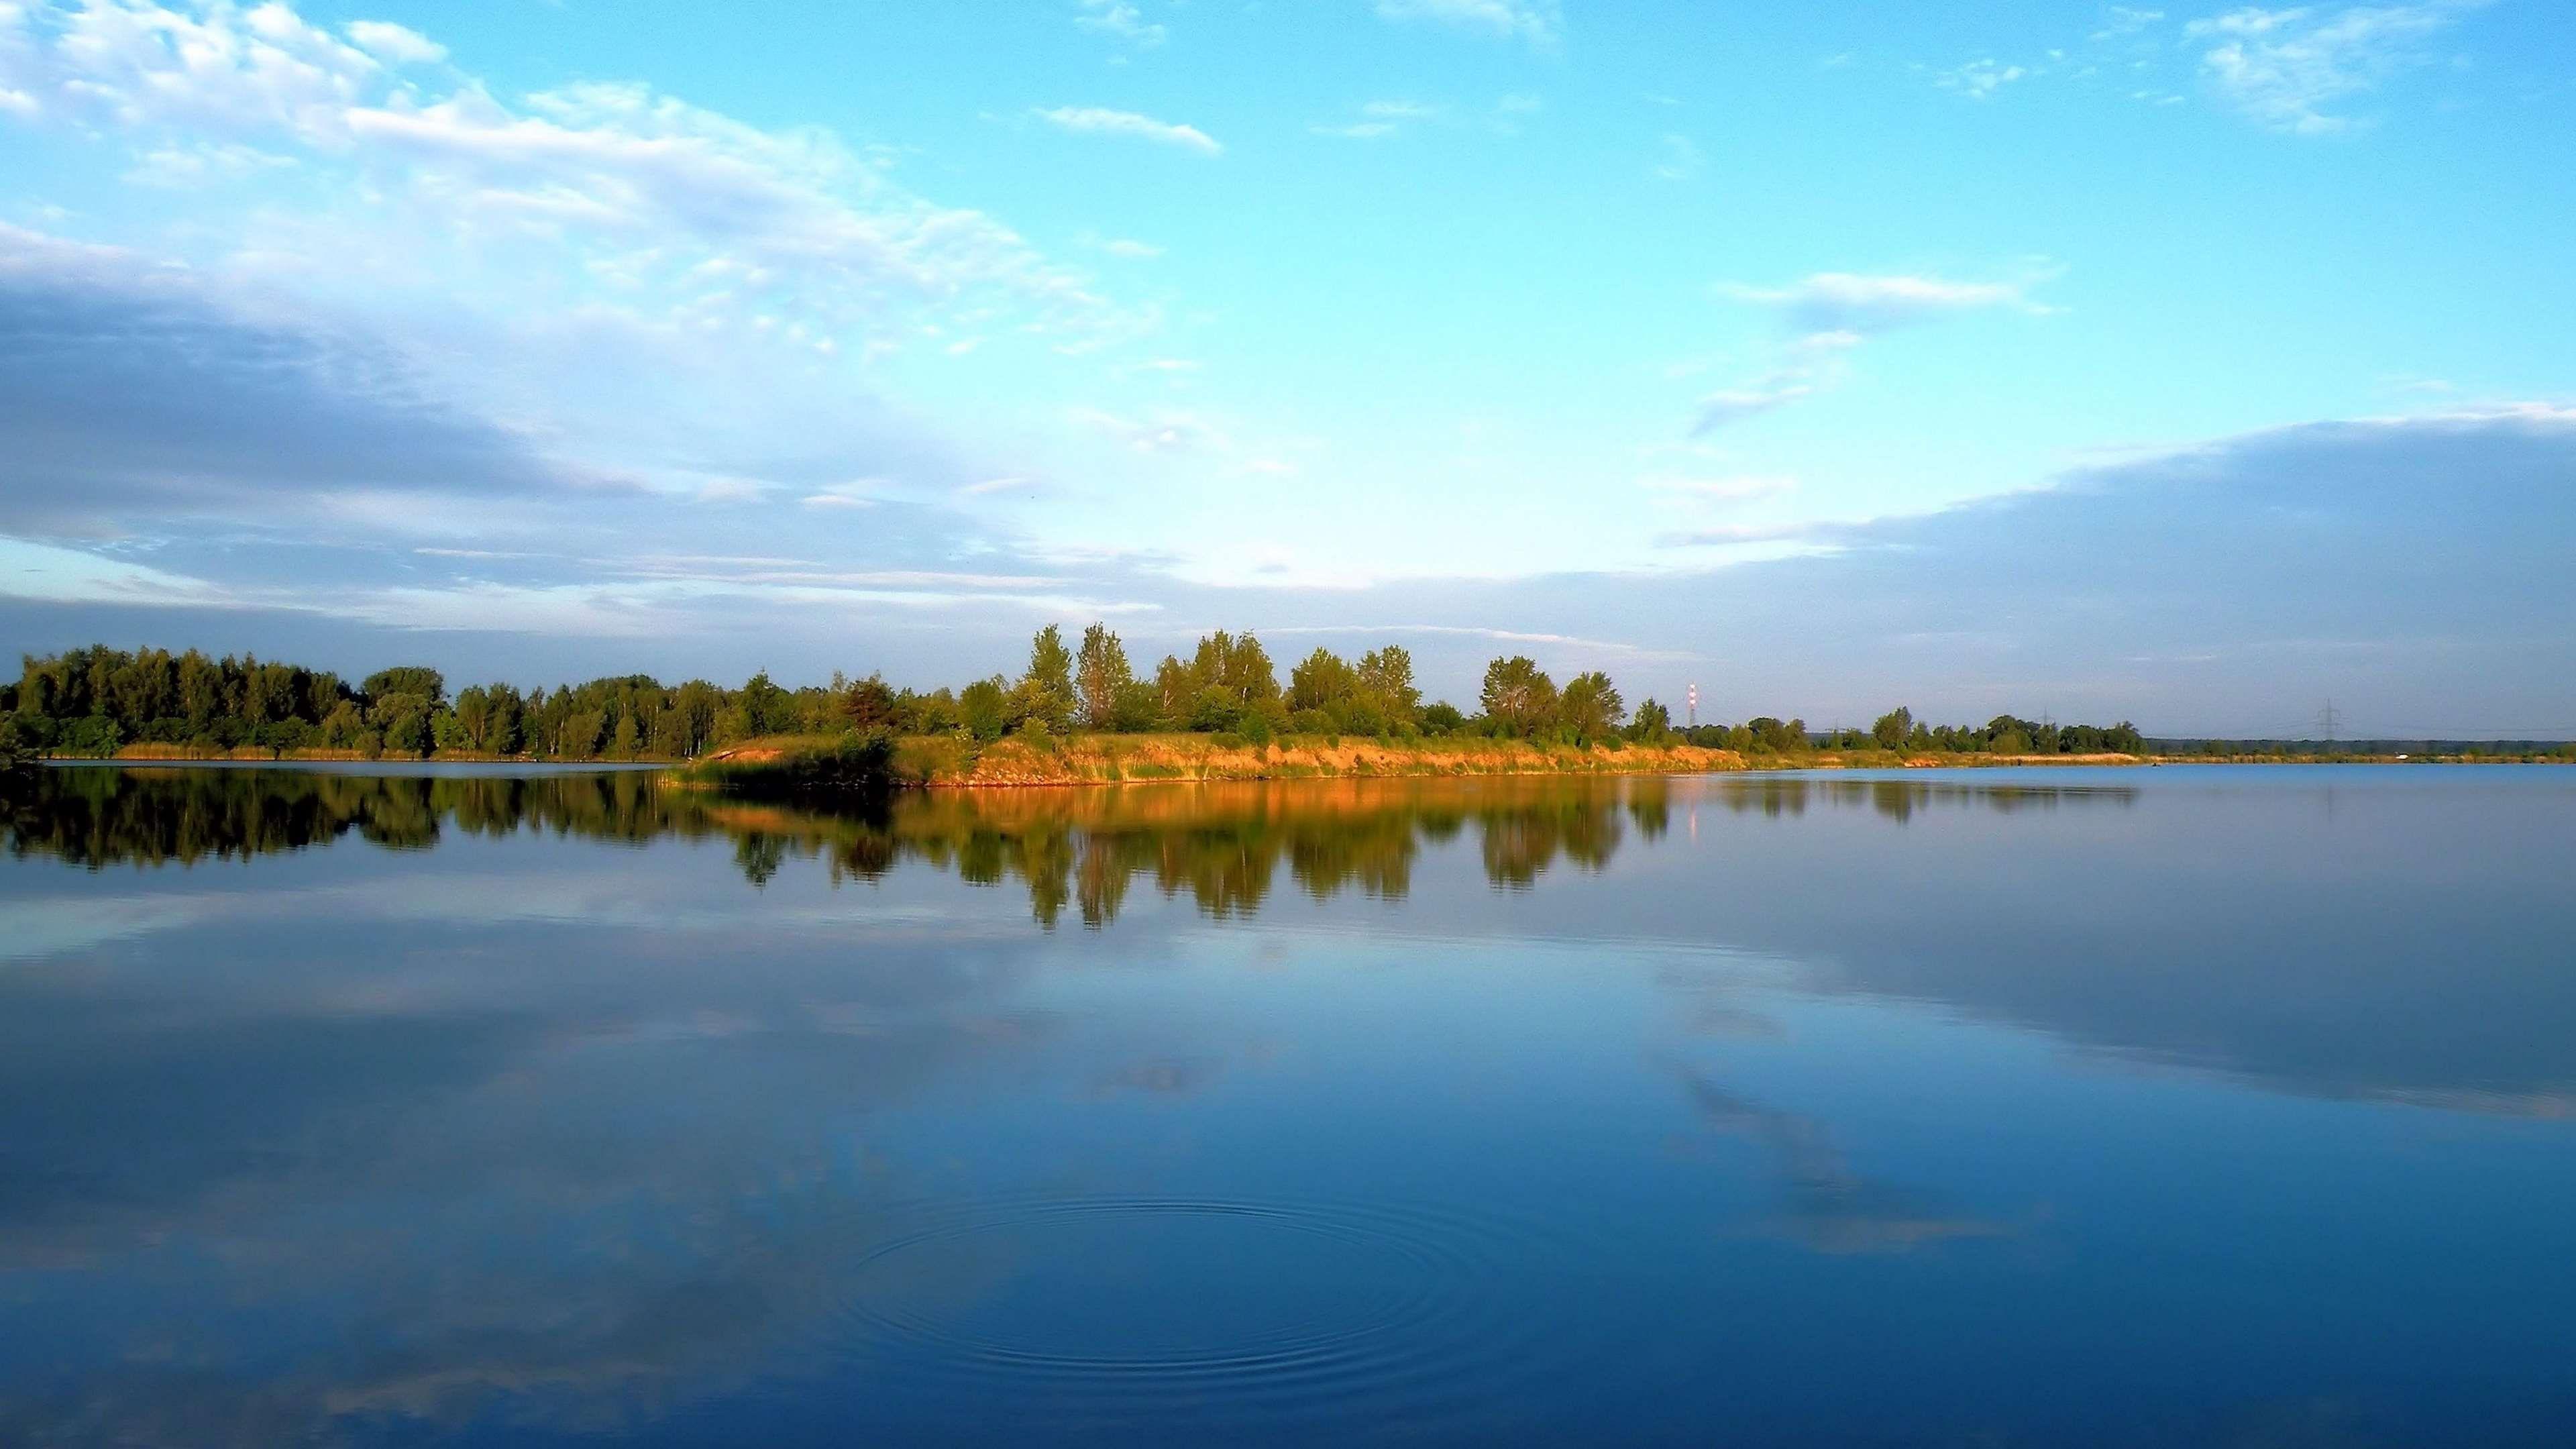 картинки панорама озера обеих